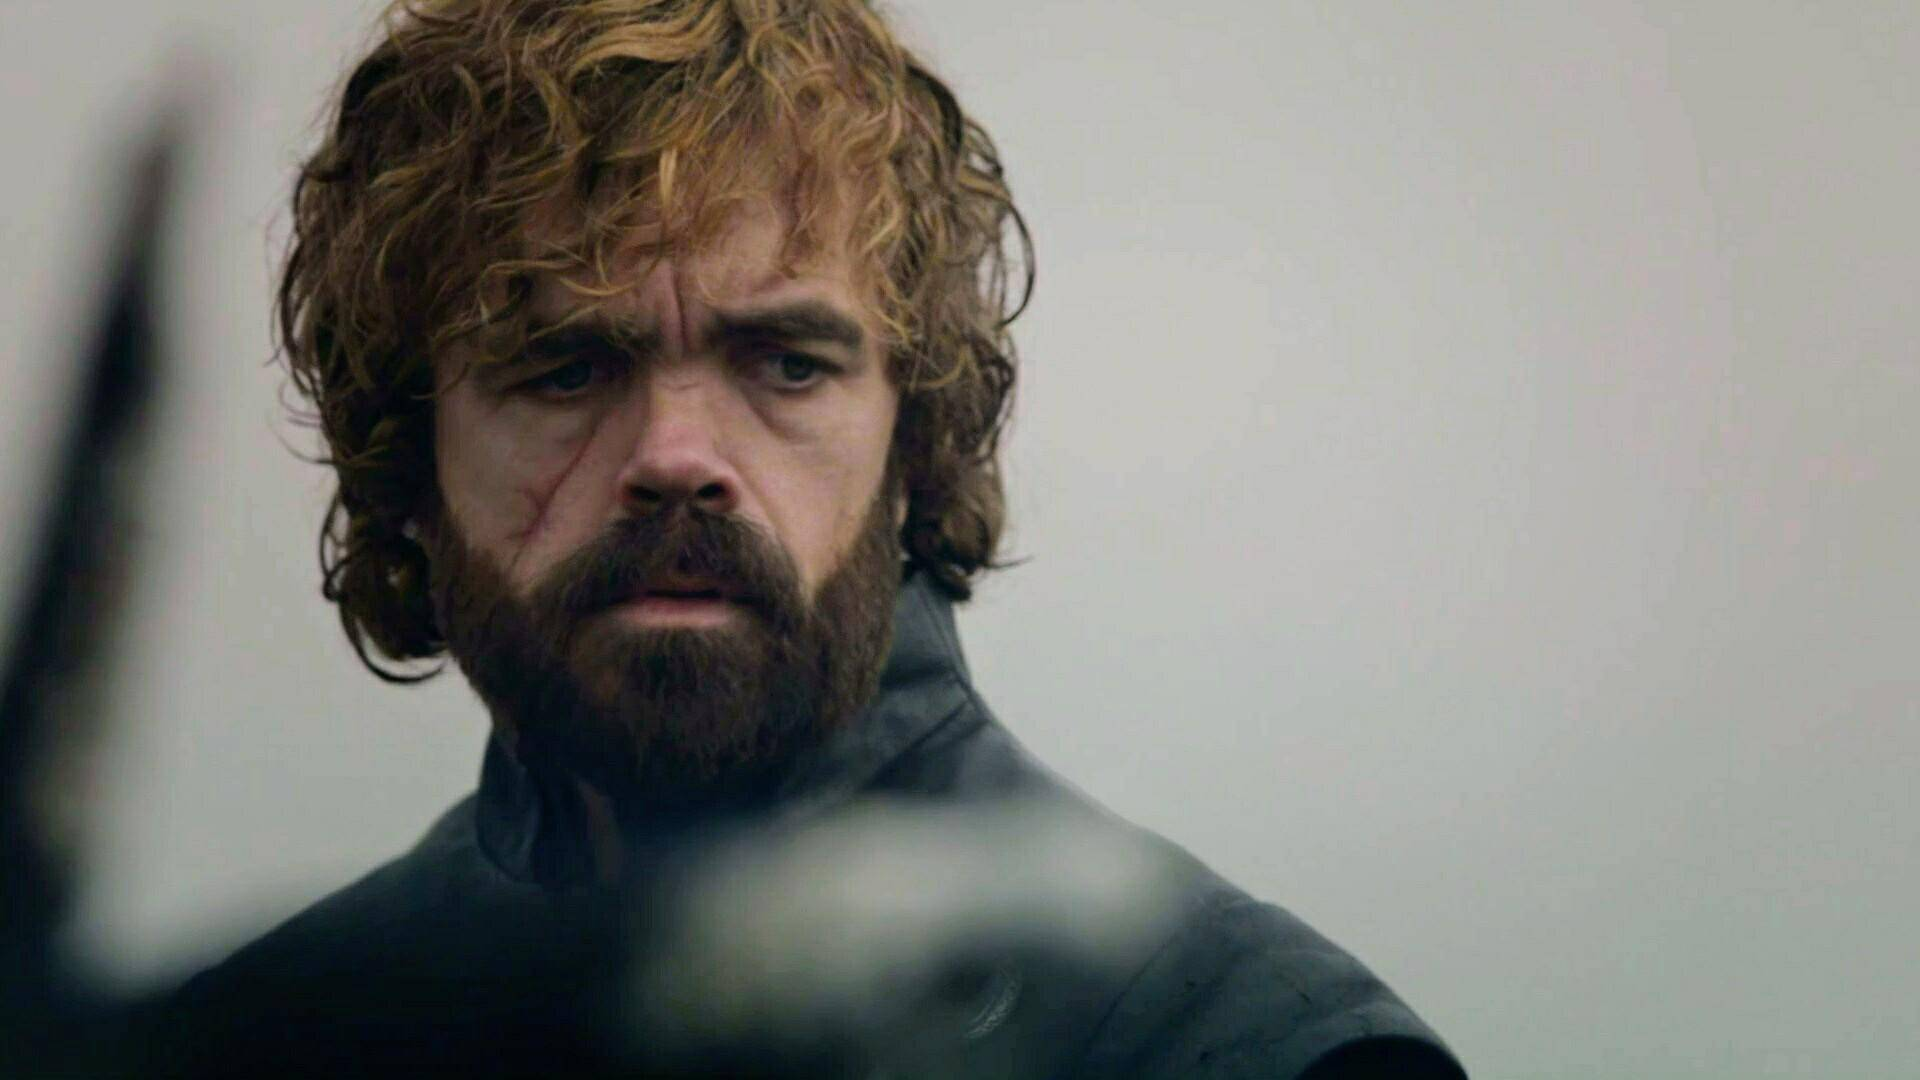 Game of Thrones Tyrion Lannister Master Antioxidant Liposomal Glutathione